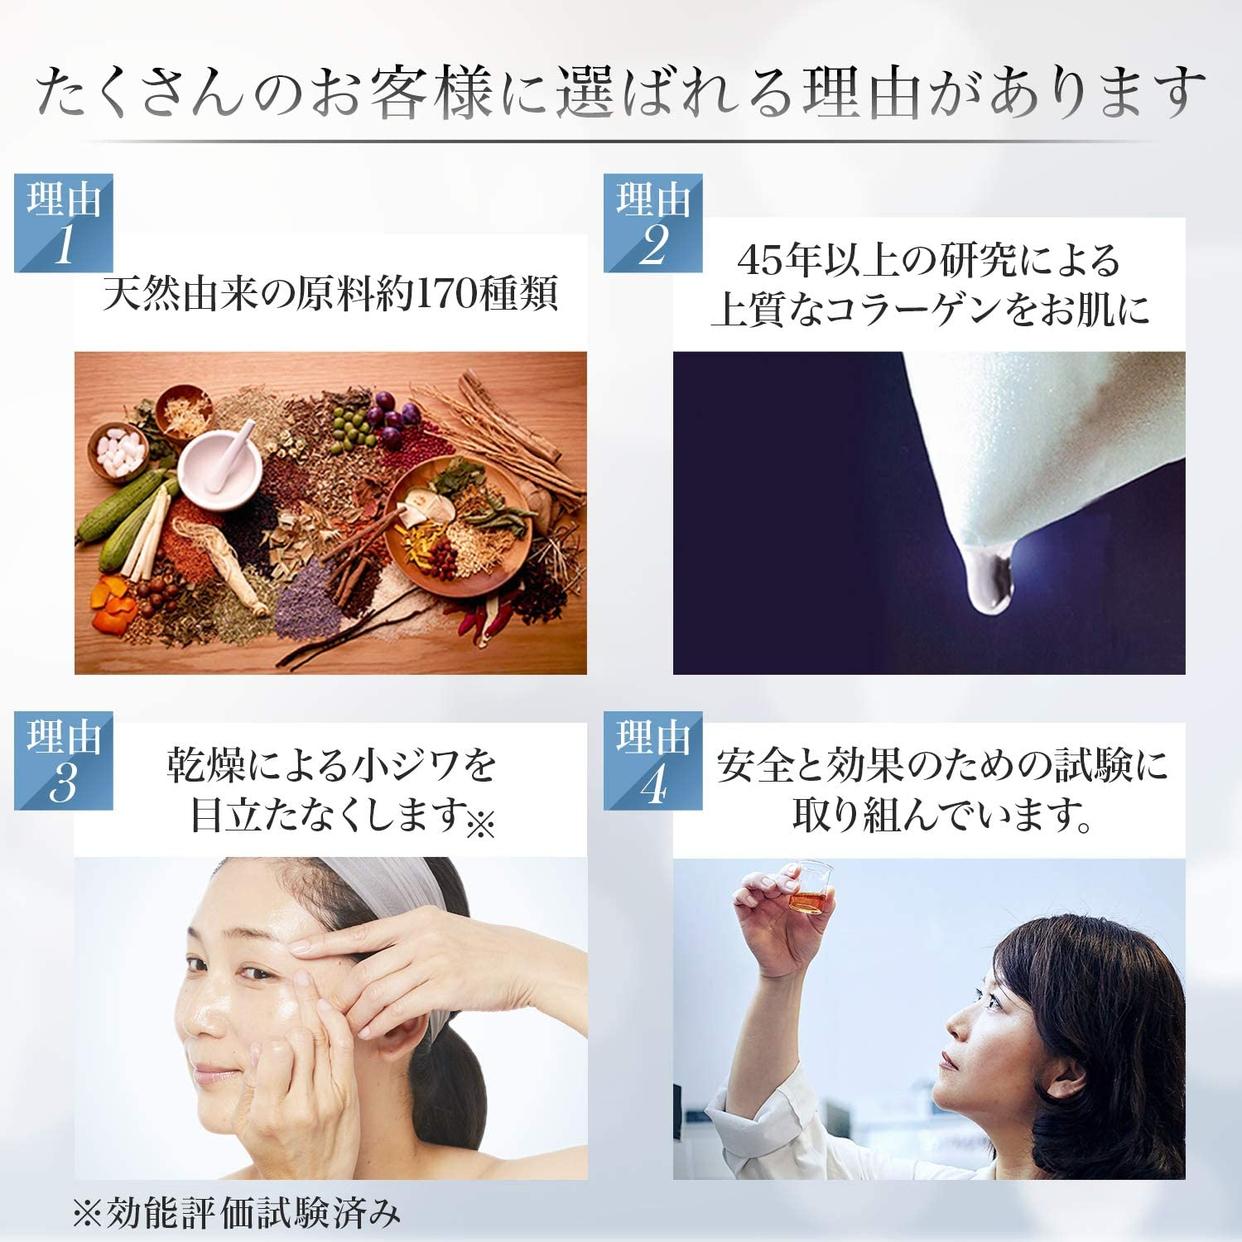 Domohorn Wrinkle(ドモホルンリンクル) 保湿液の商品画像7